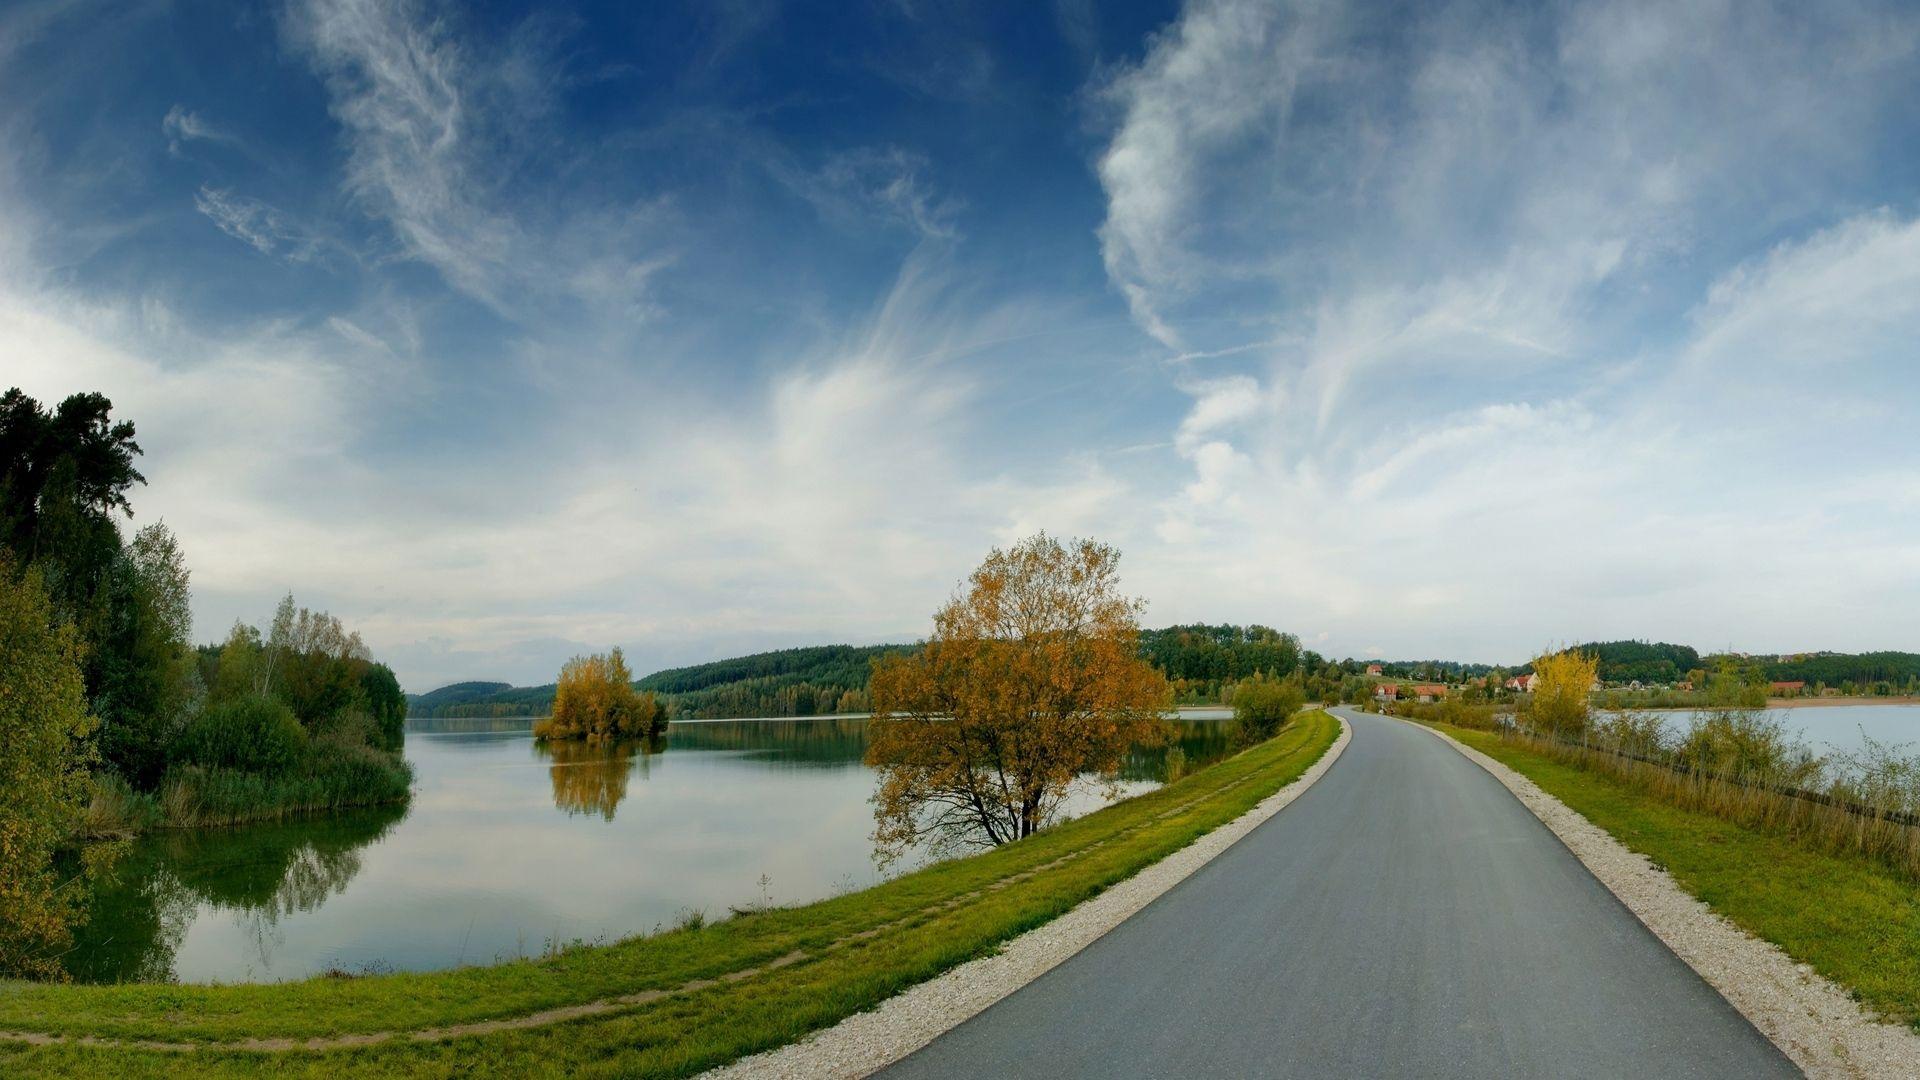 Download Wallpaper 1920x1080 road, lakes, coast, landscape